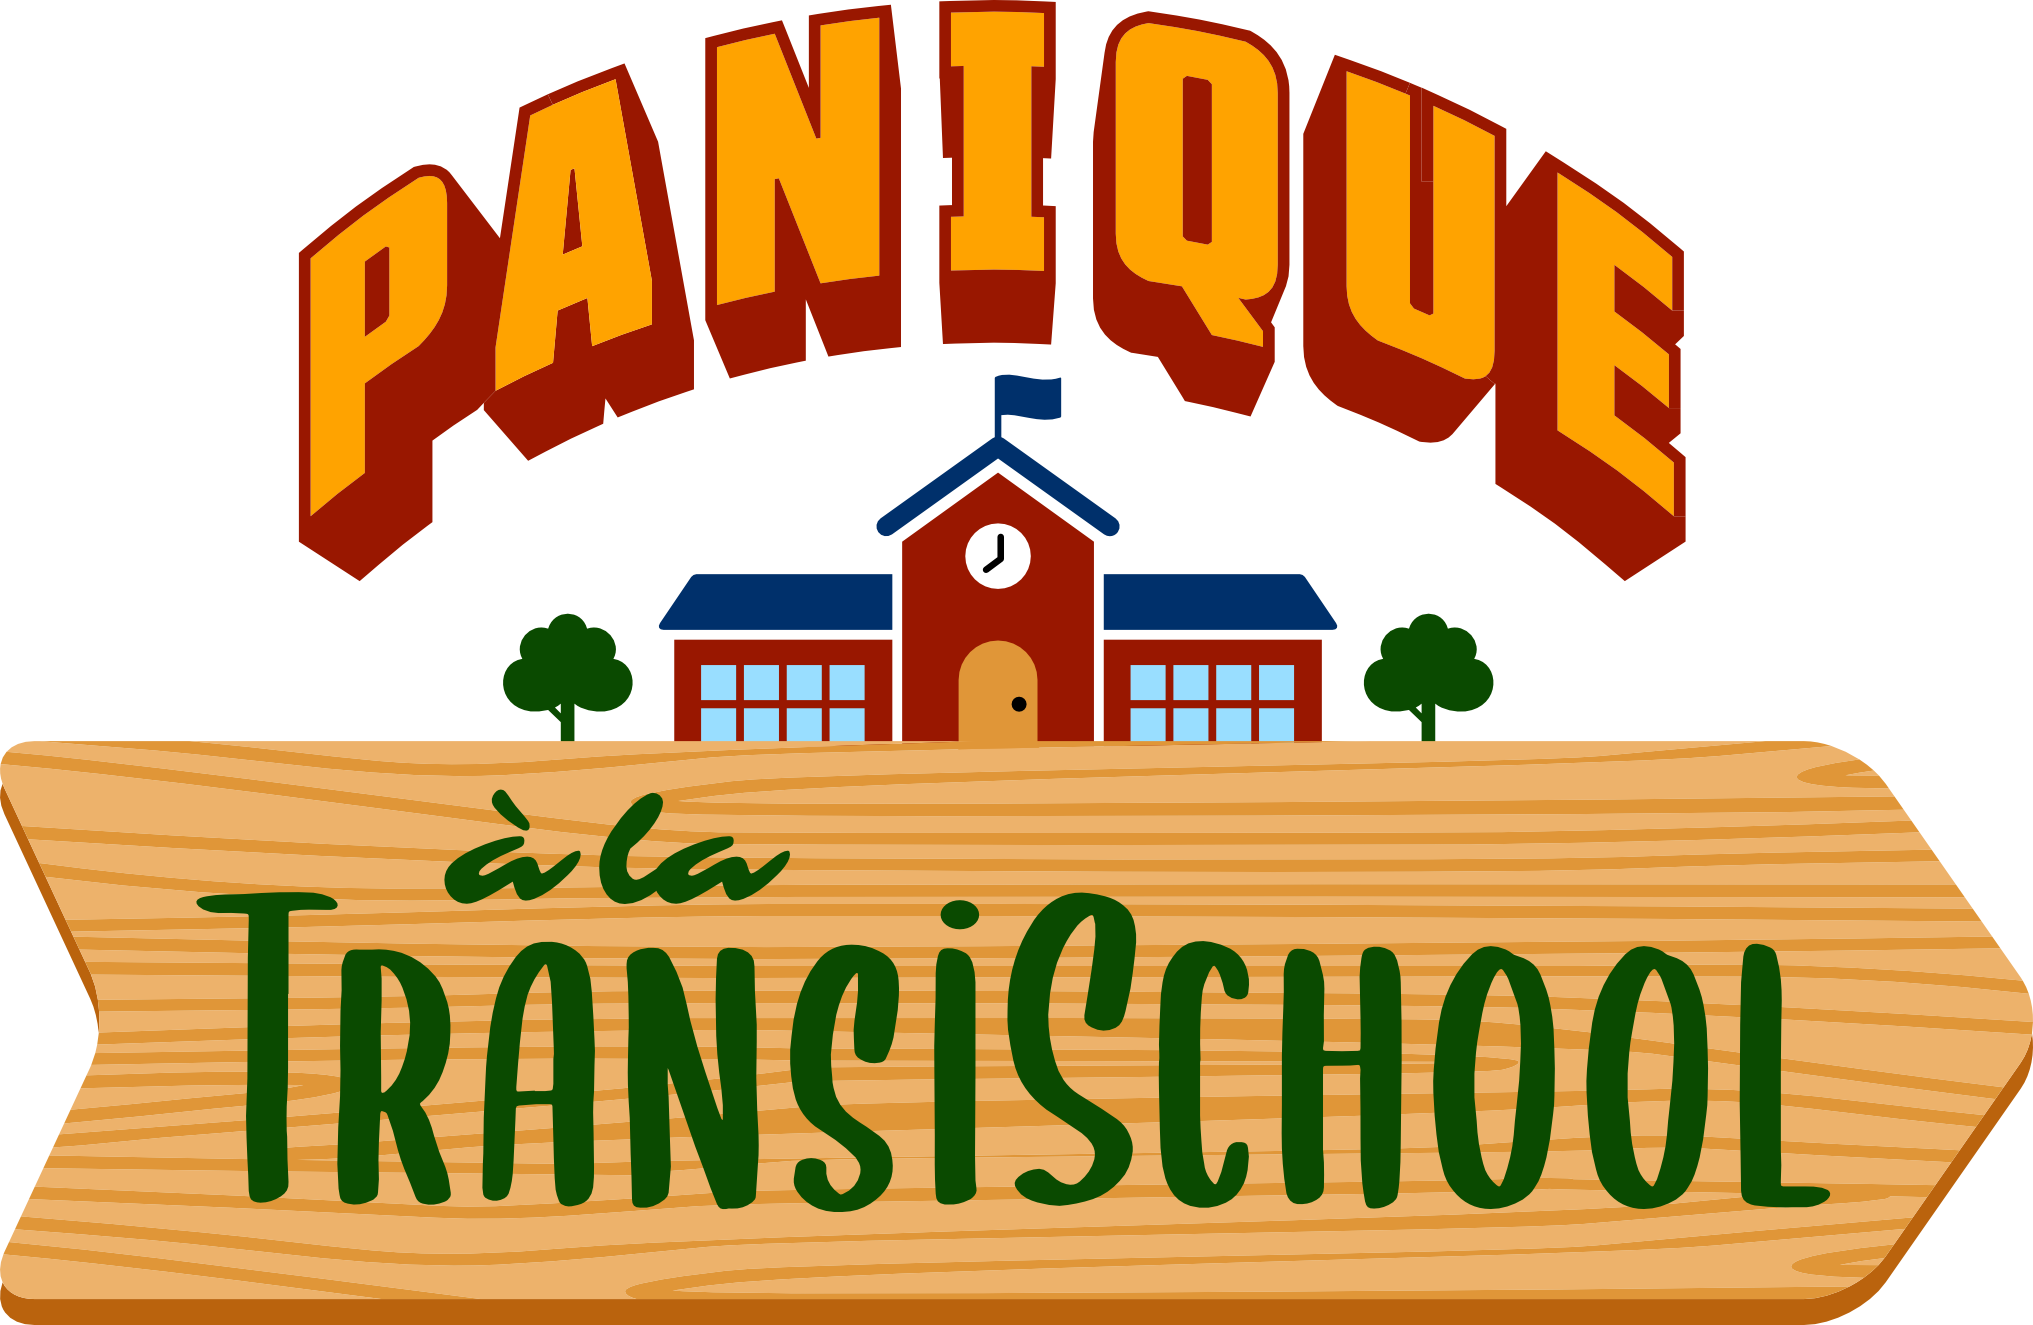 logo-panique-a-la-transischool-big-1.png